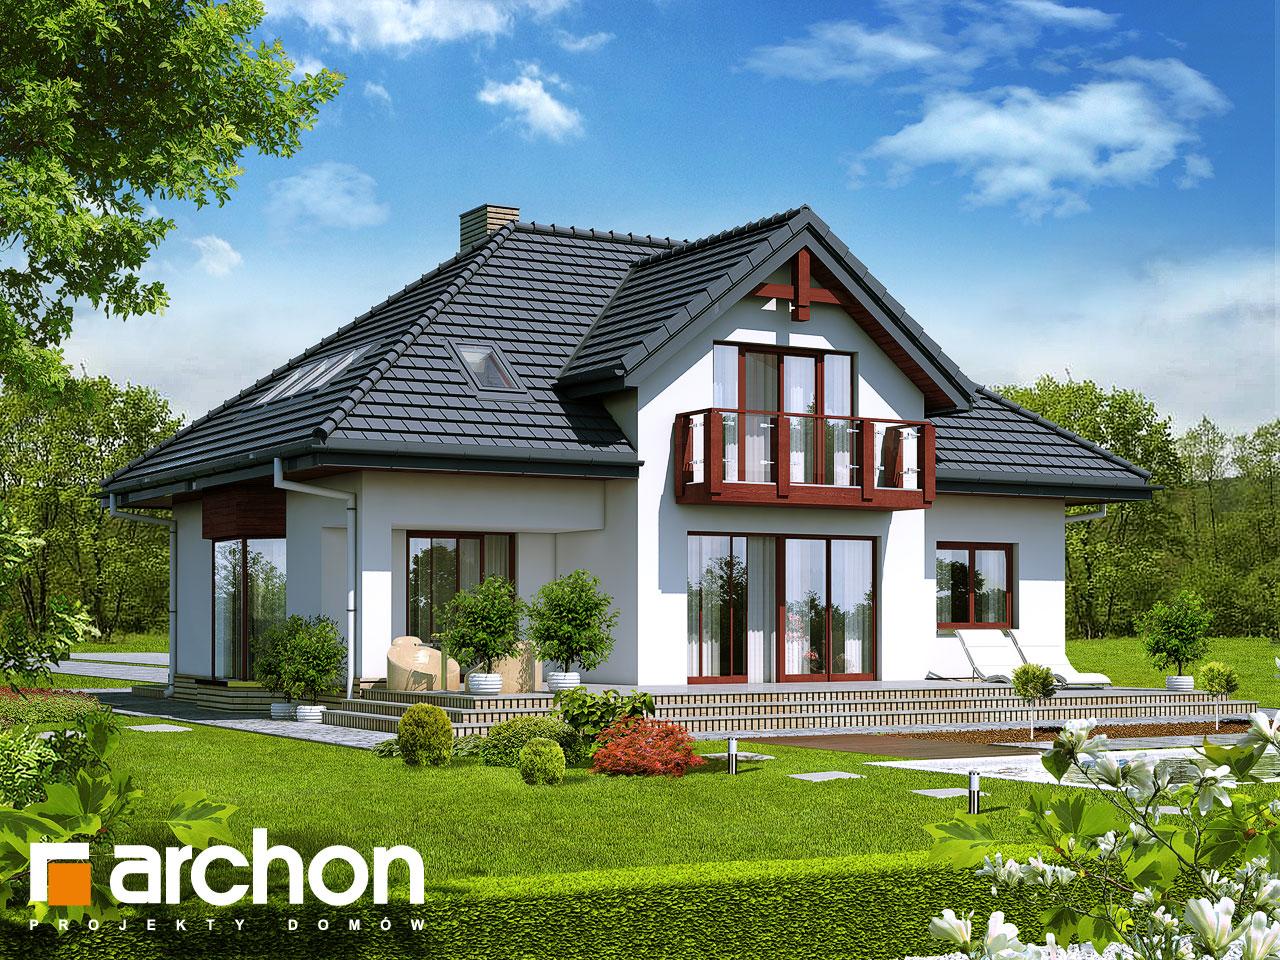 Проект будинку ARCHON+ Будинок в каллатеях 2 вер.2 Вид 2